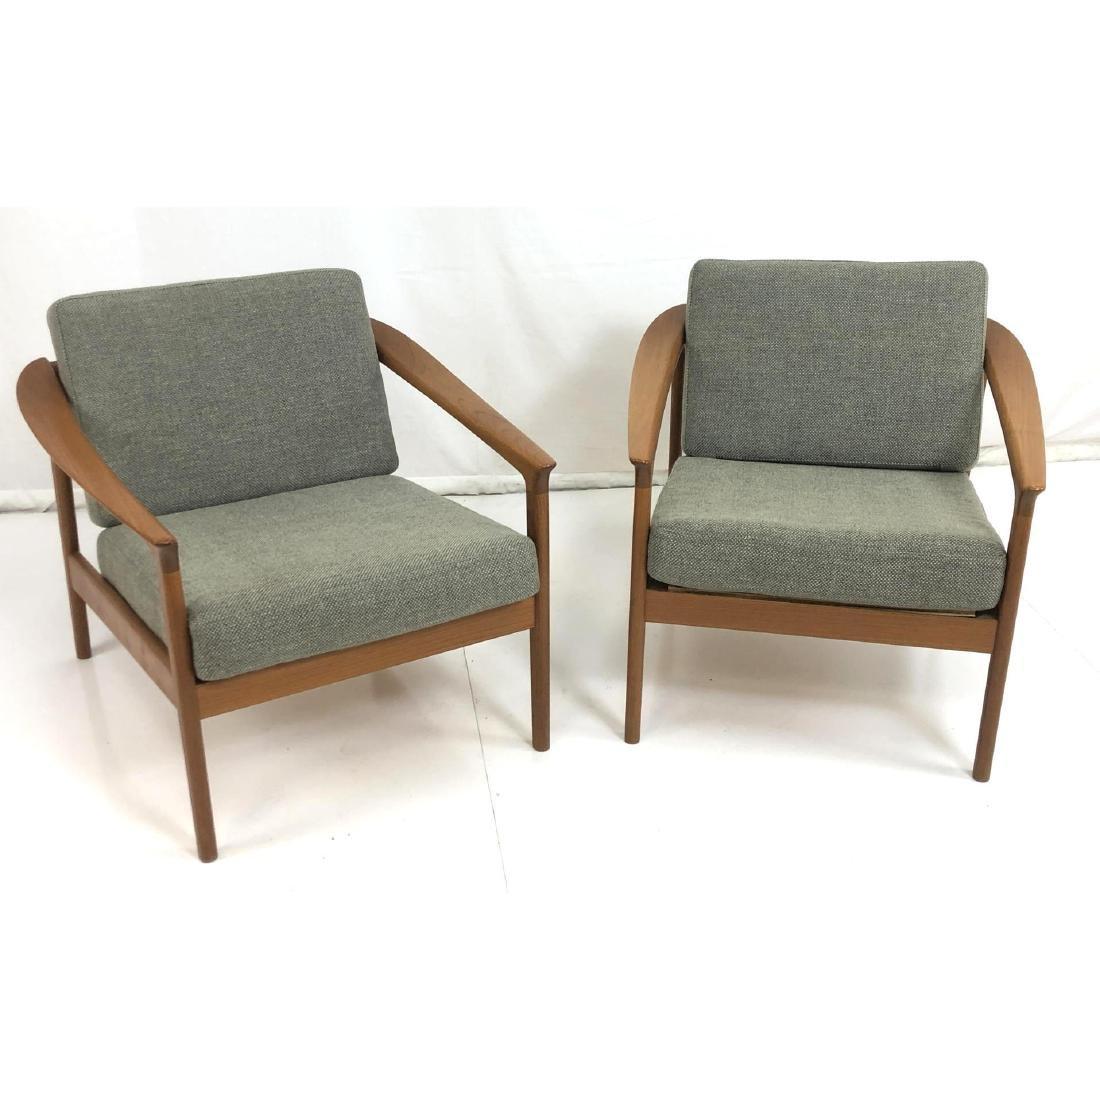 Pr FOLKE OHLSSON Danish Modern Teak Lounge Chairs